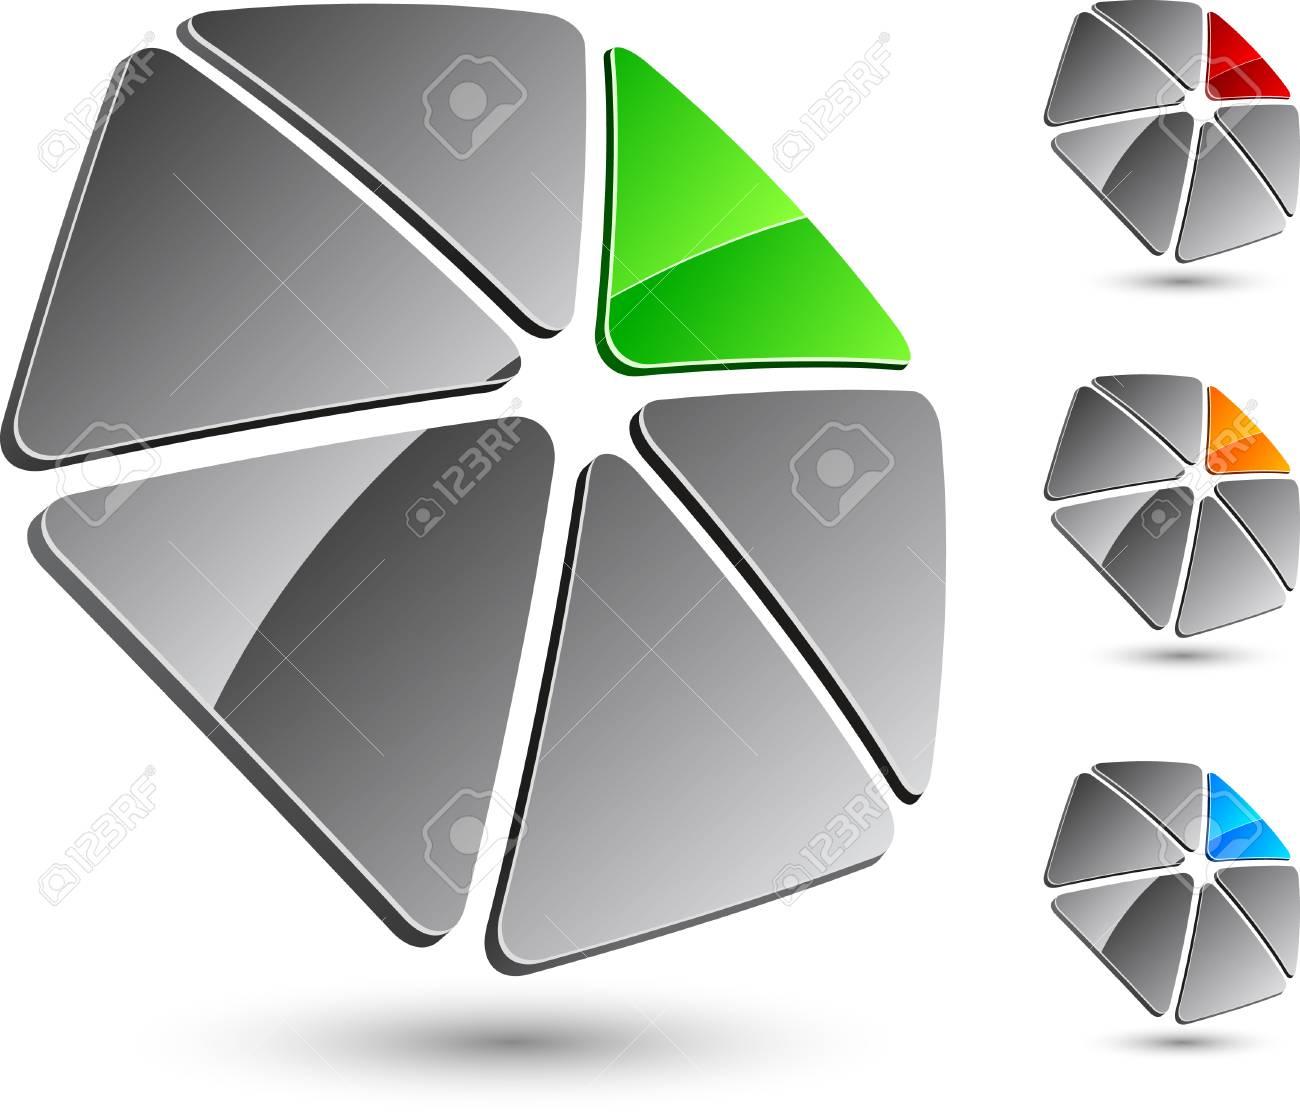 Abstract company symbol. Vector illustration. Stock Vector - 5181064